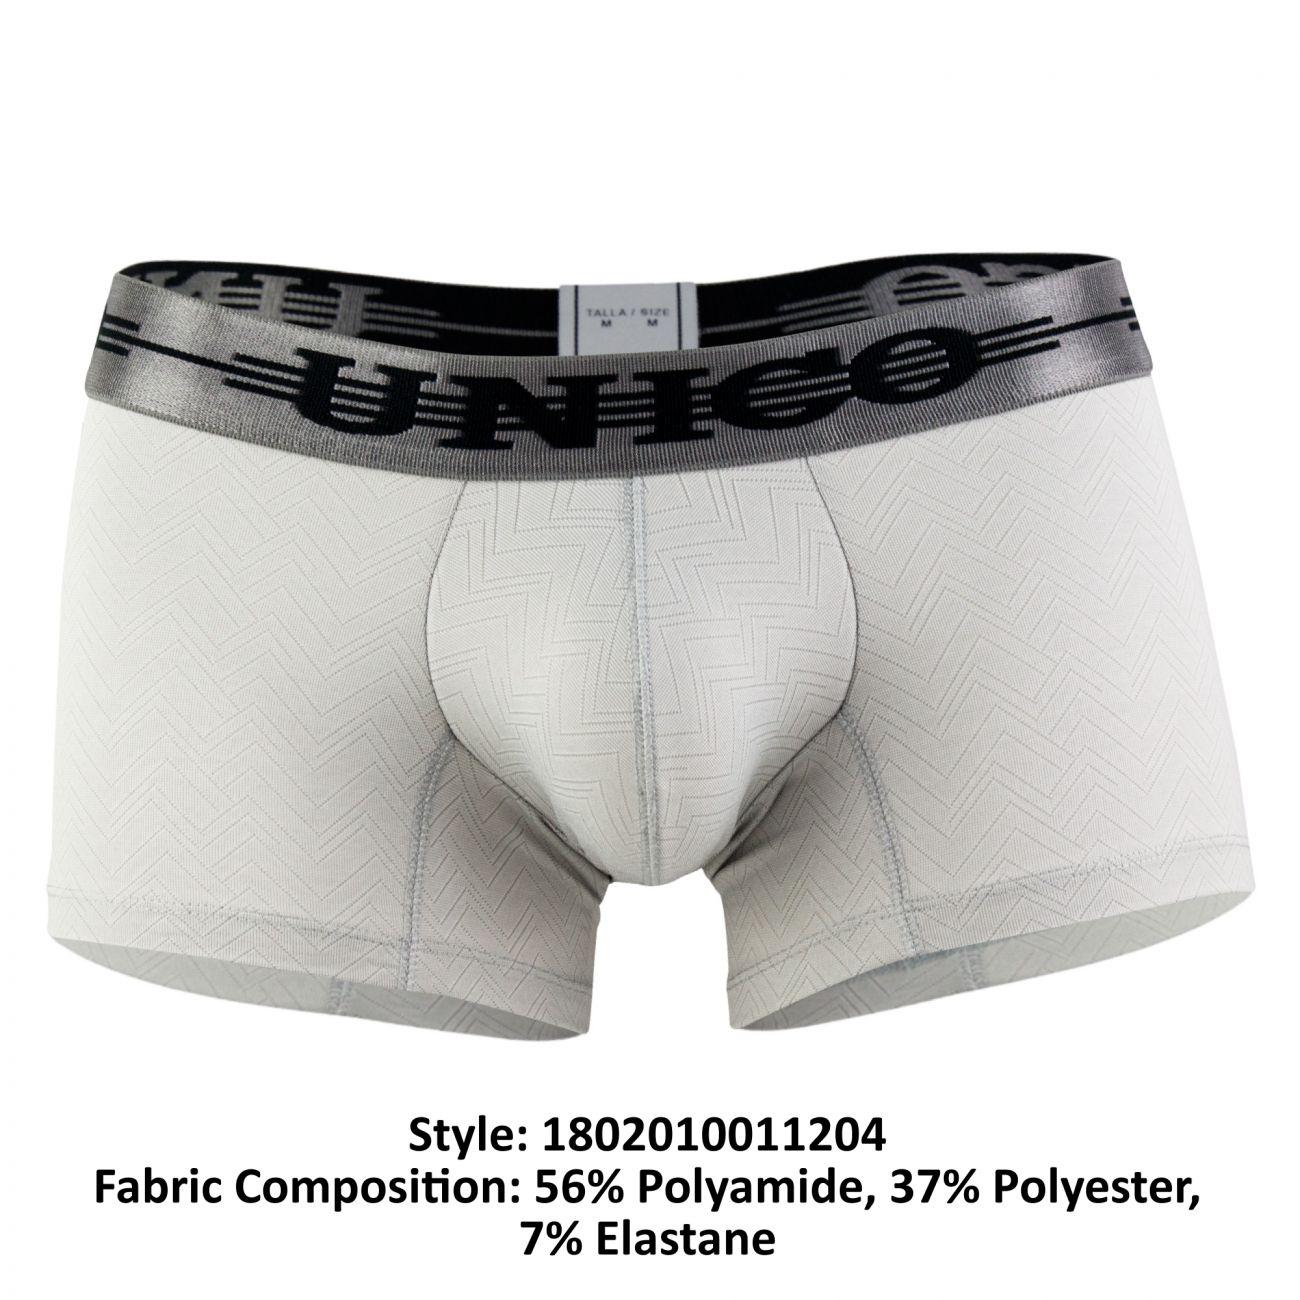 892253639c42 Mens-Underwear-Unico-1802010011204-Boxer-Briefs-True thumbnail 6